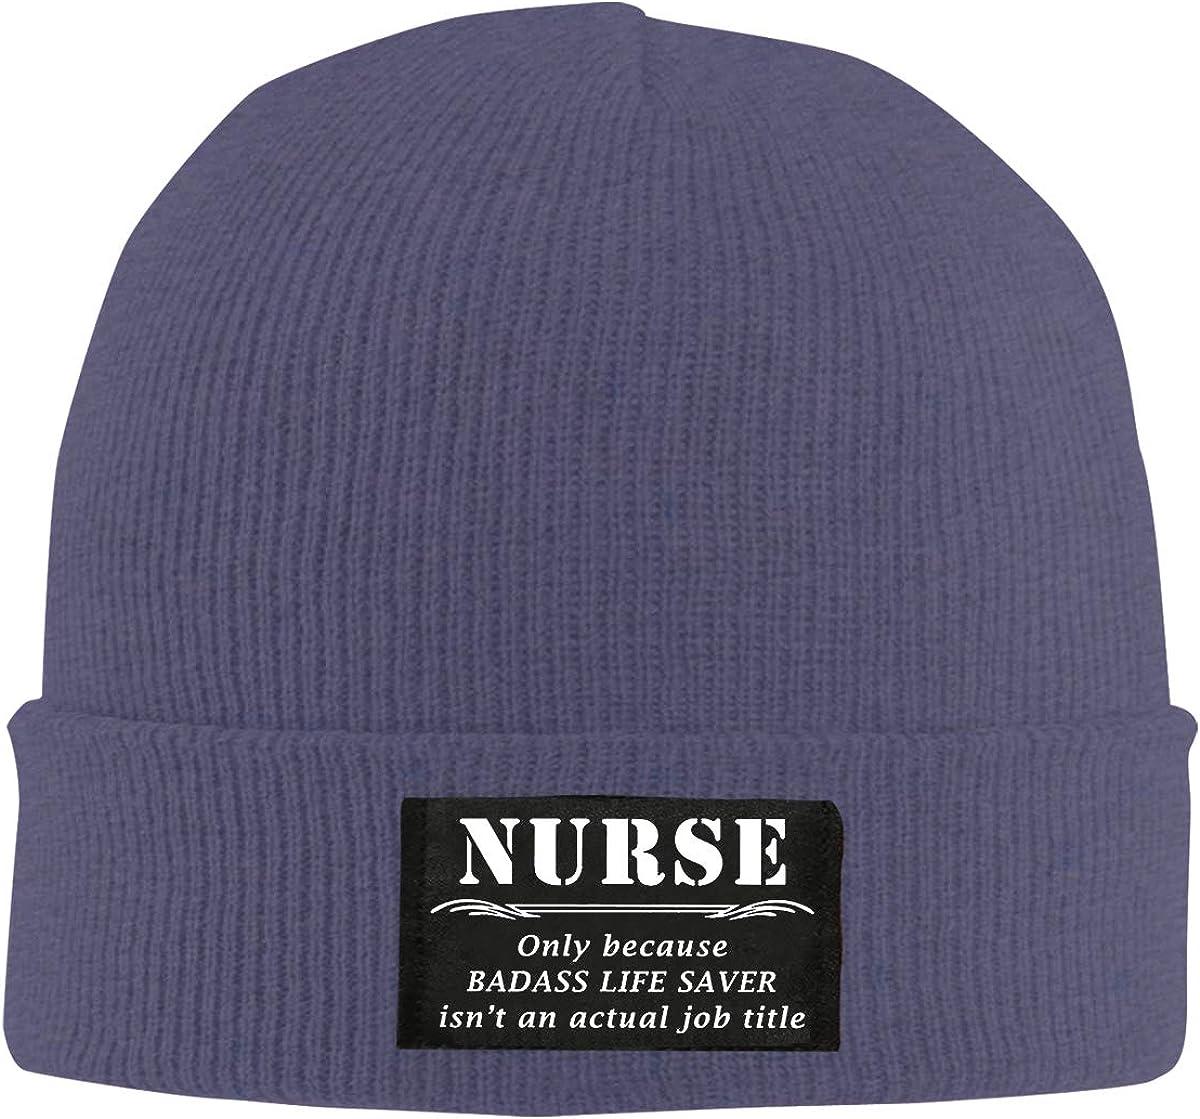 Men Women Nurse Only Because My Real Job Title Skull Hat Beanie Cap Winter Knit Hat Cap